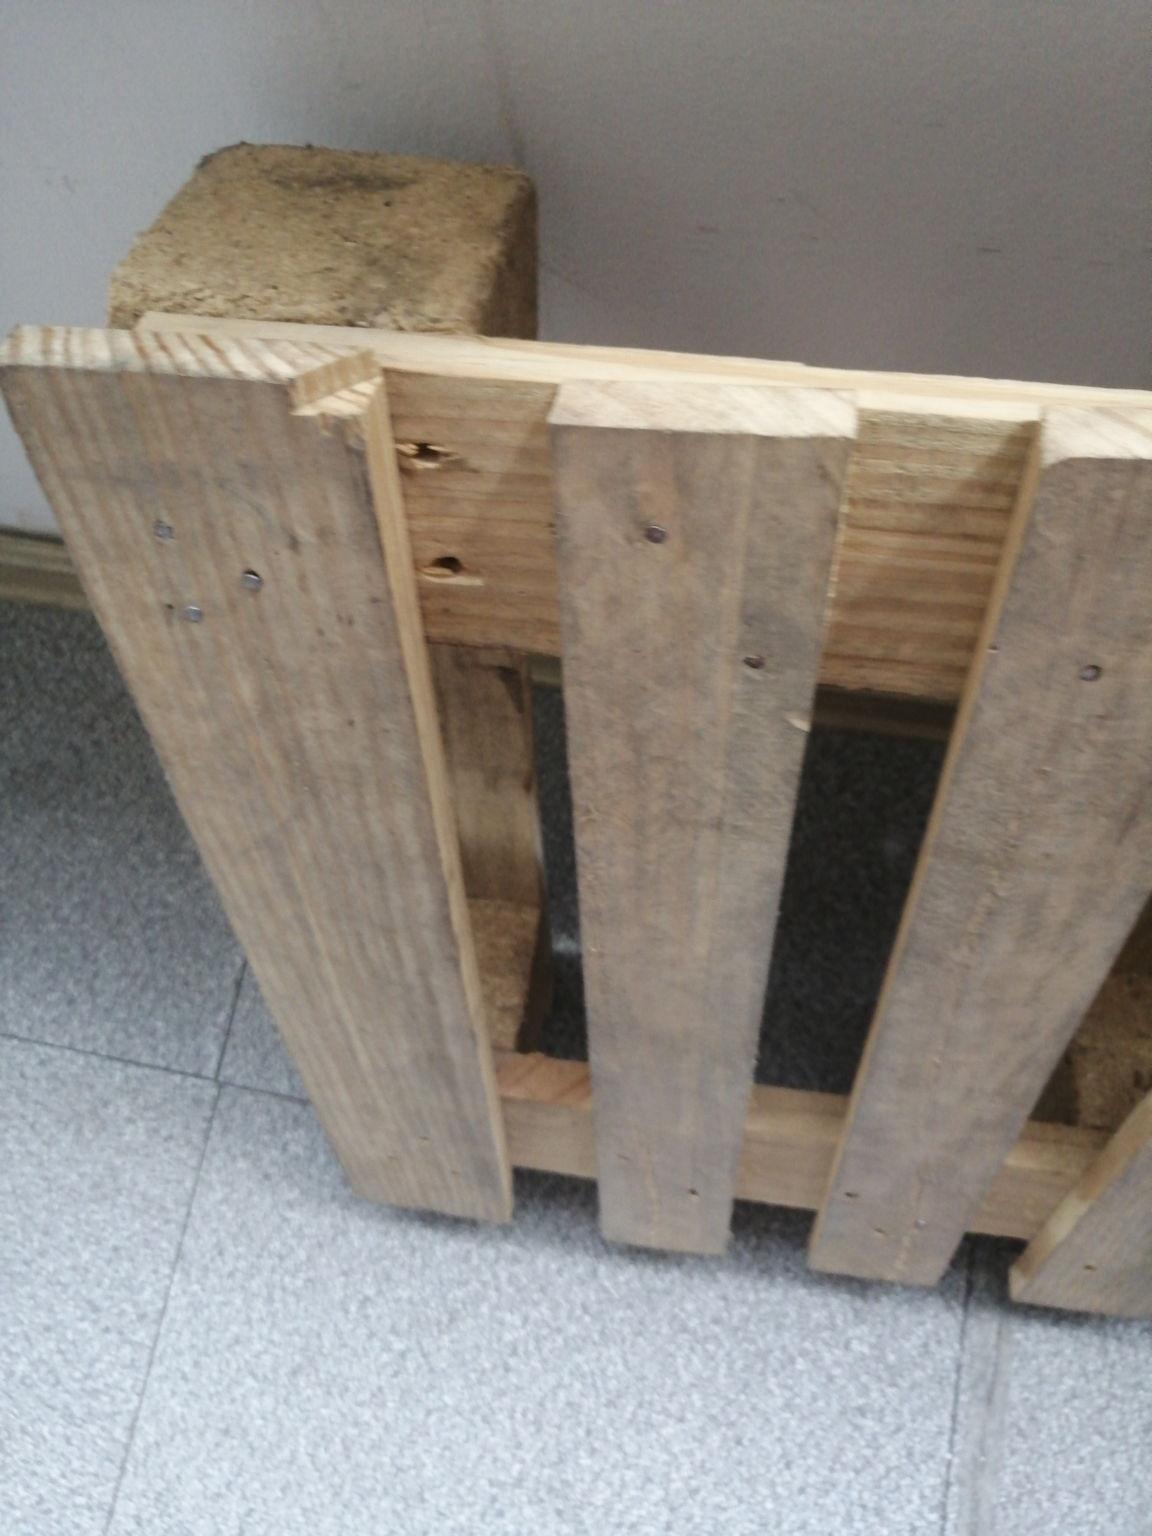 沧州木胶板供应多少一?,ョろ﹩?木胶板